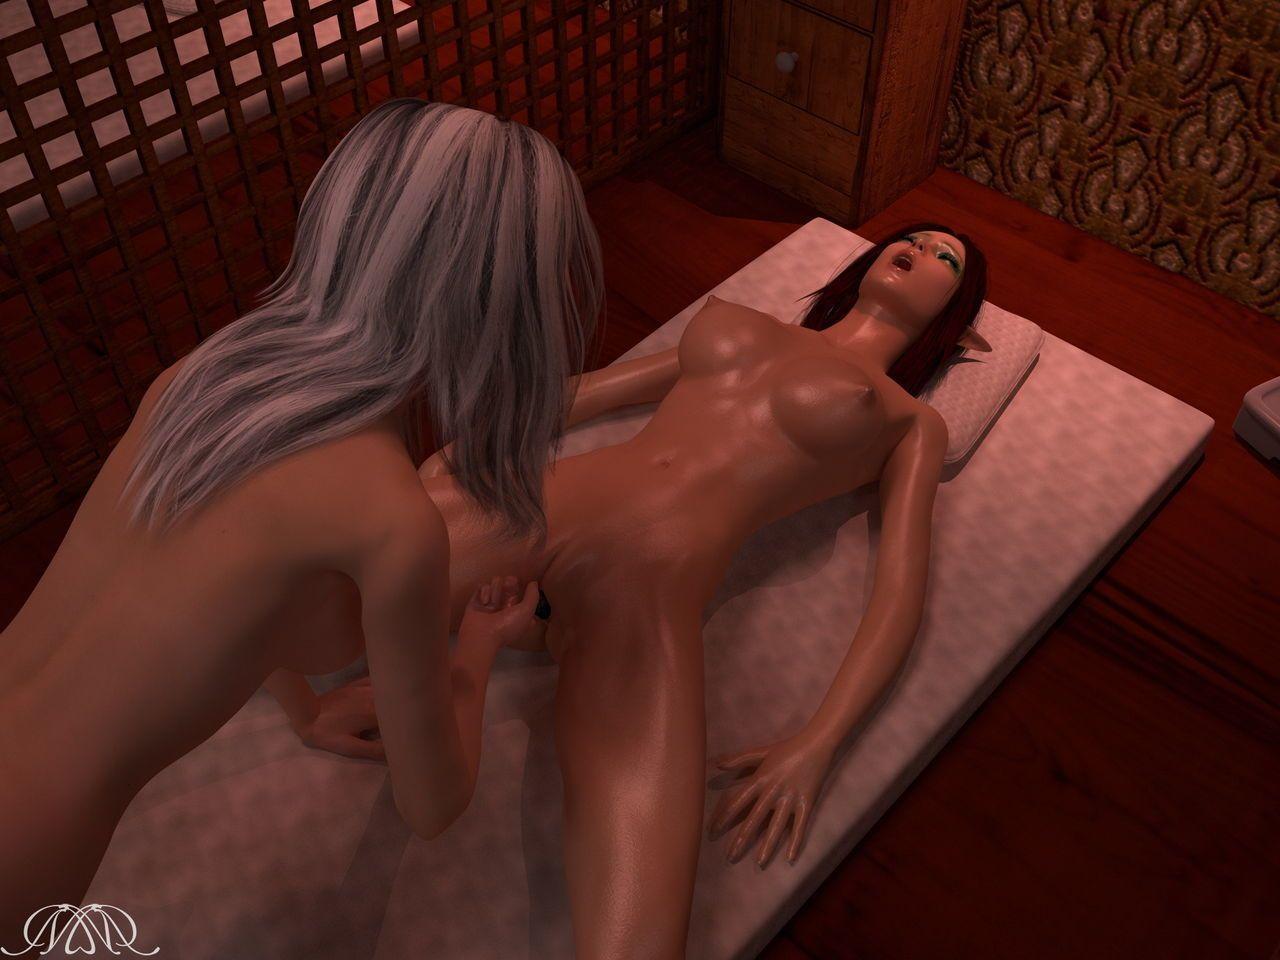 [Morfium] Afterwork Massage - part 3